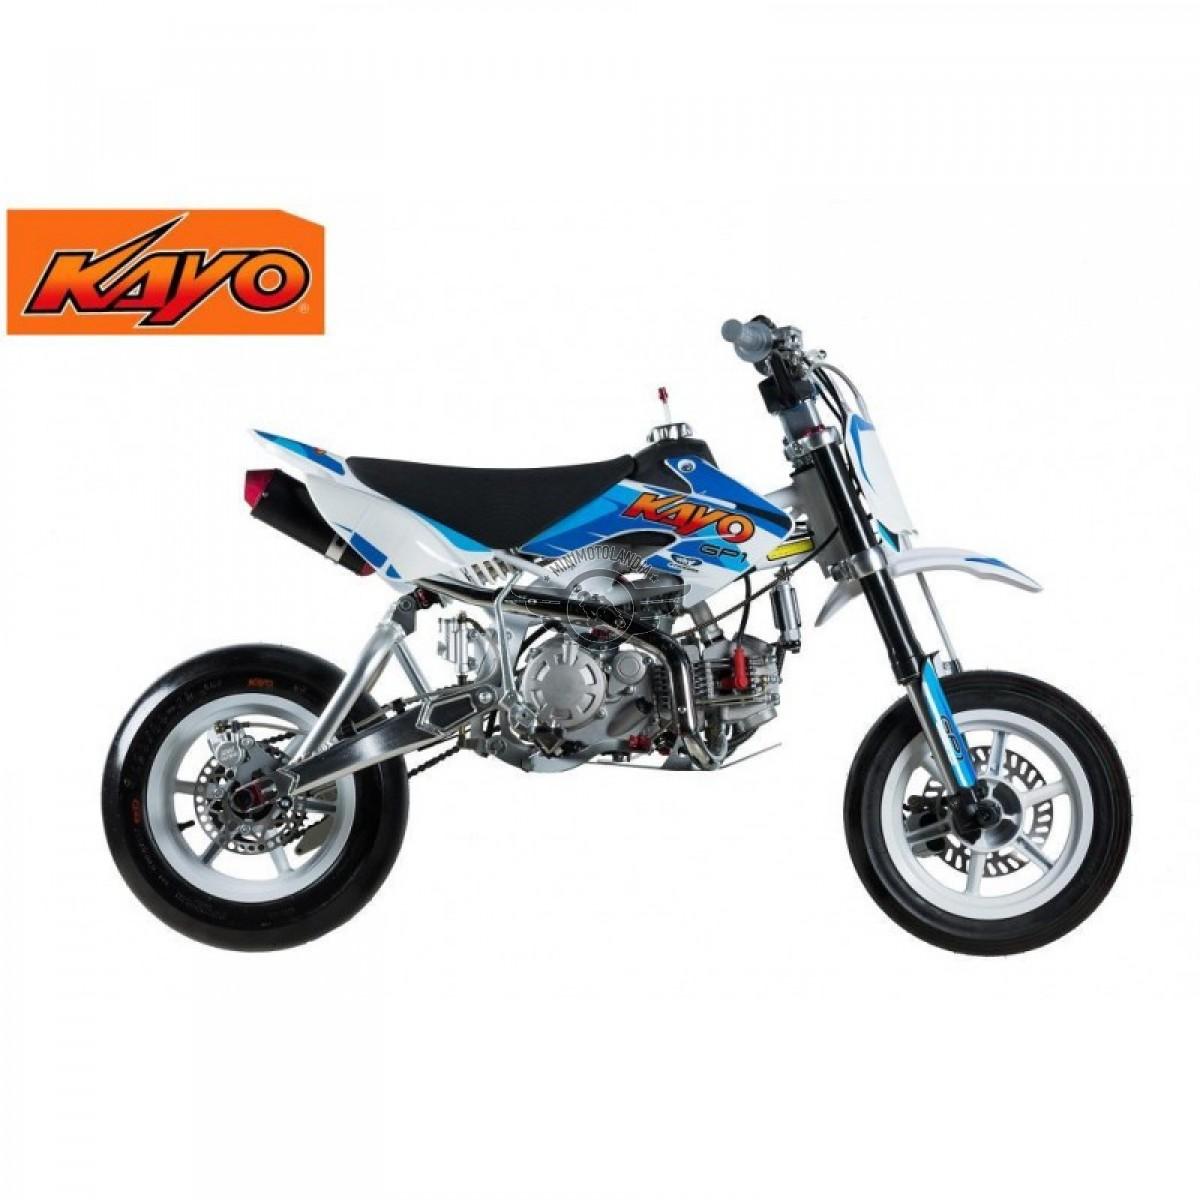 pit bike supermotard gp1 kayo 156cc motard racing minimotolandia. Black Bedroom Furniture Sets. Home Design Ideas